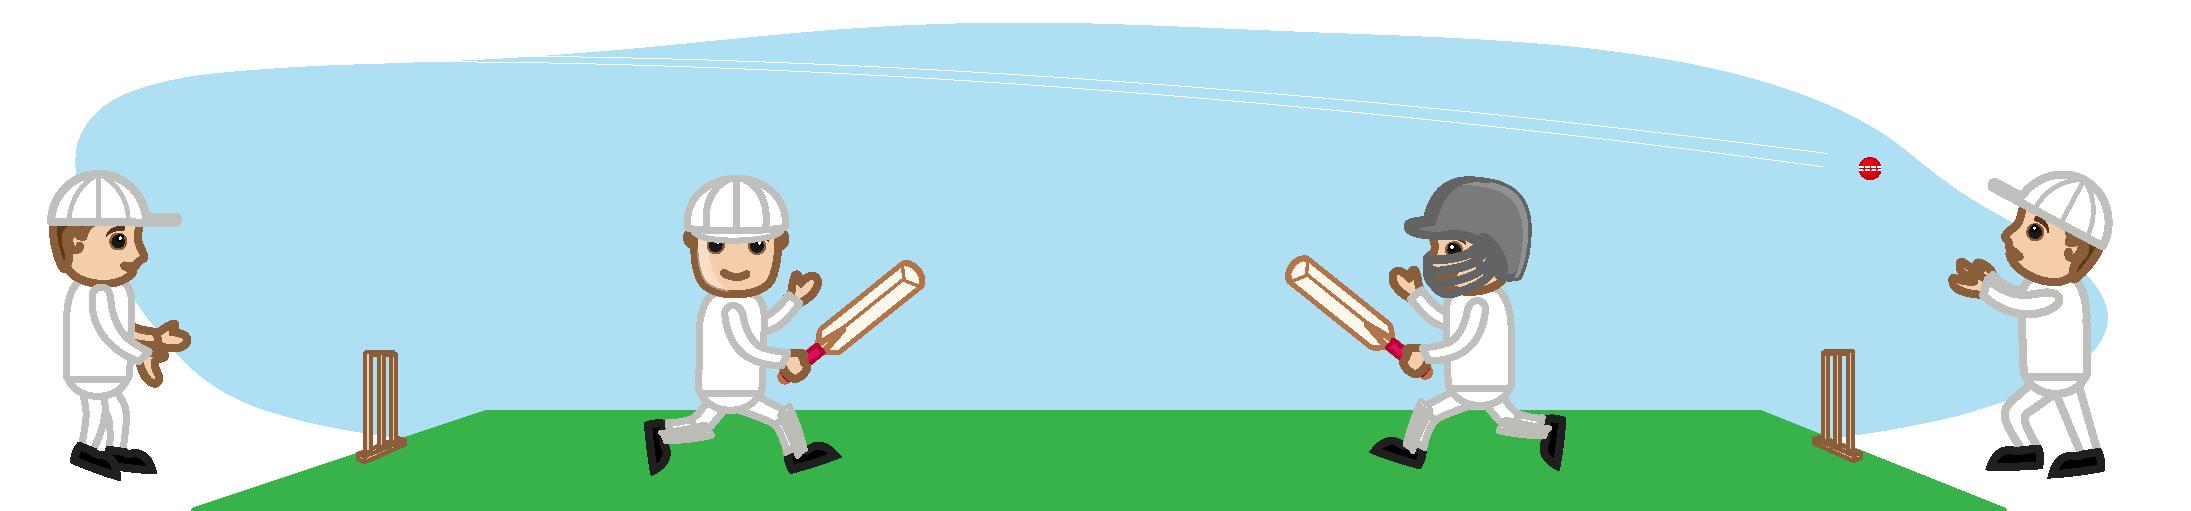 Subtraction Example: Sri Lanka made 236 runs and India made 126 runs in an international cricket match.